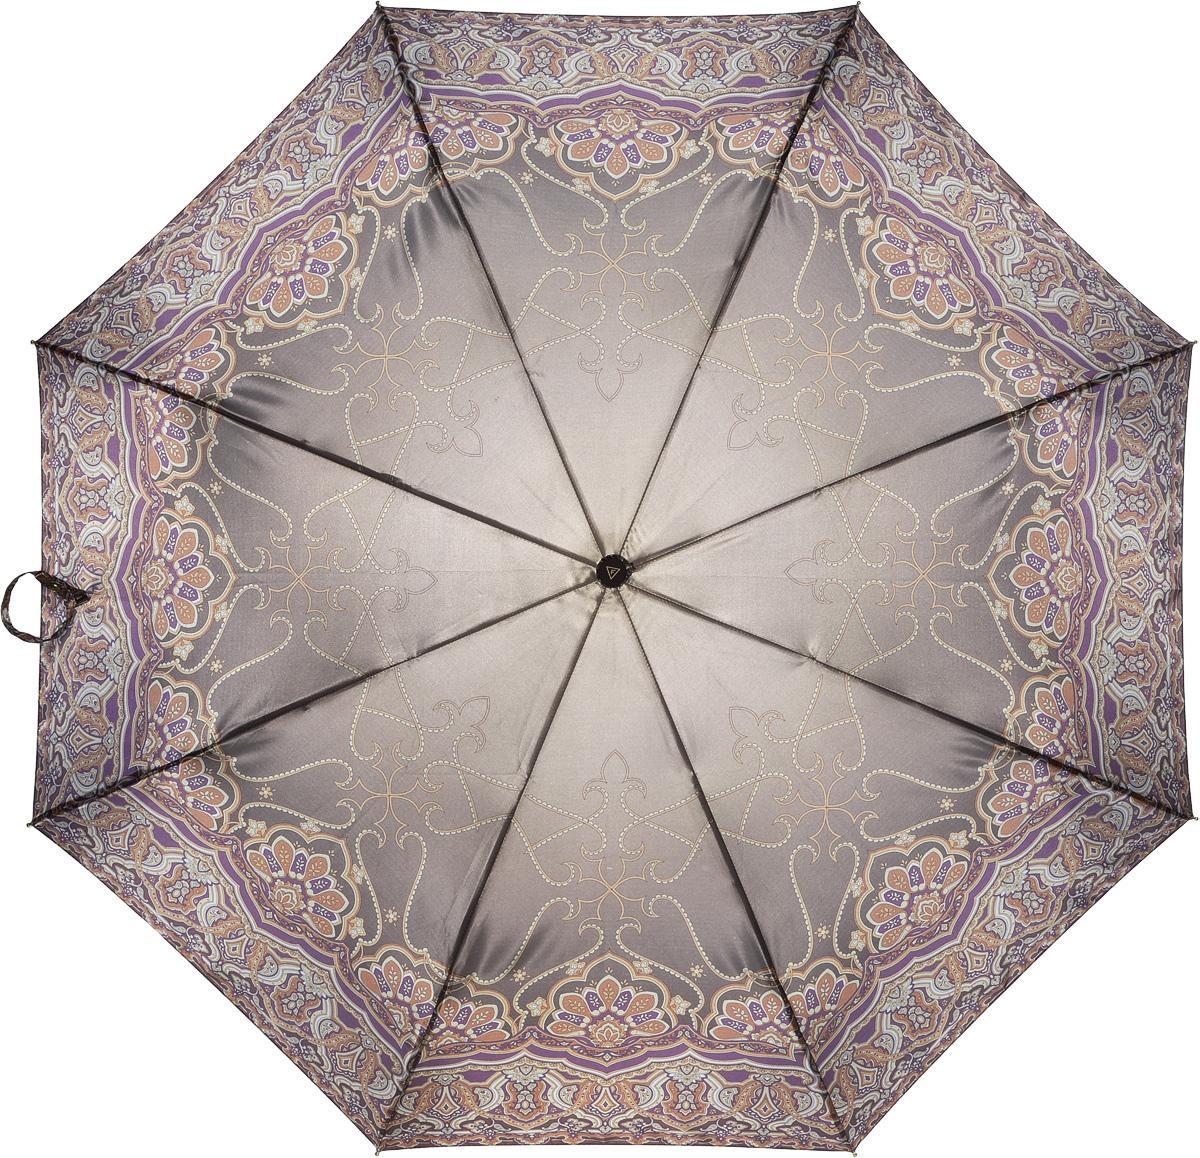 Зонт женский Fabretti, автомат, 3 сложения. L-16107-13L-16107-13Зонт женский Fabretti, облегченный суперавтомат, 3 сложения